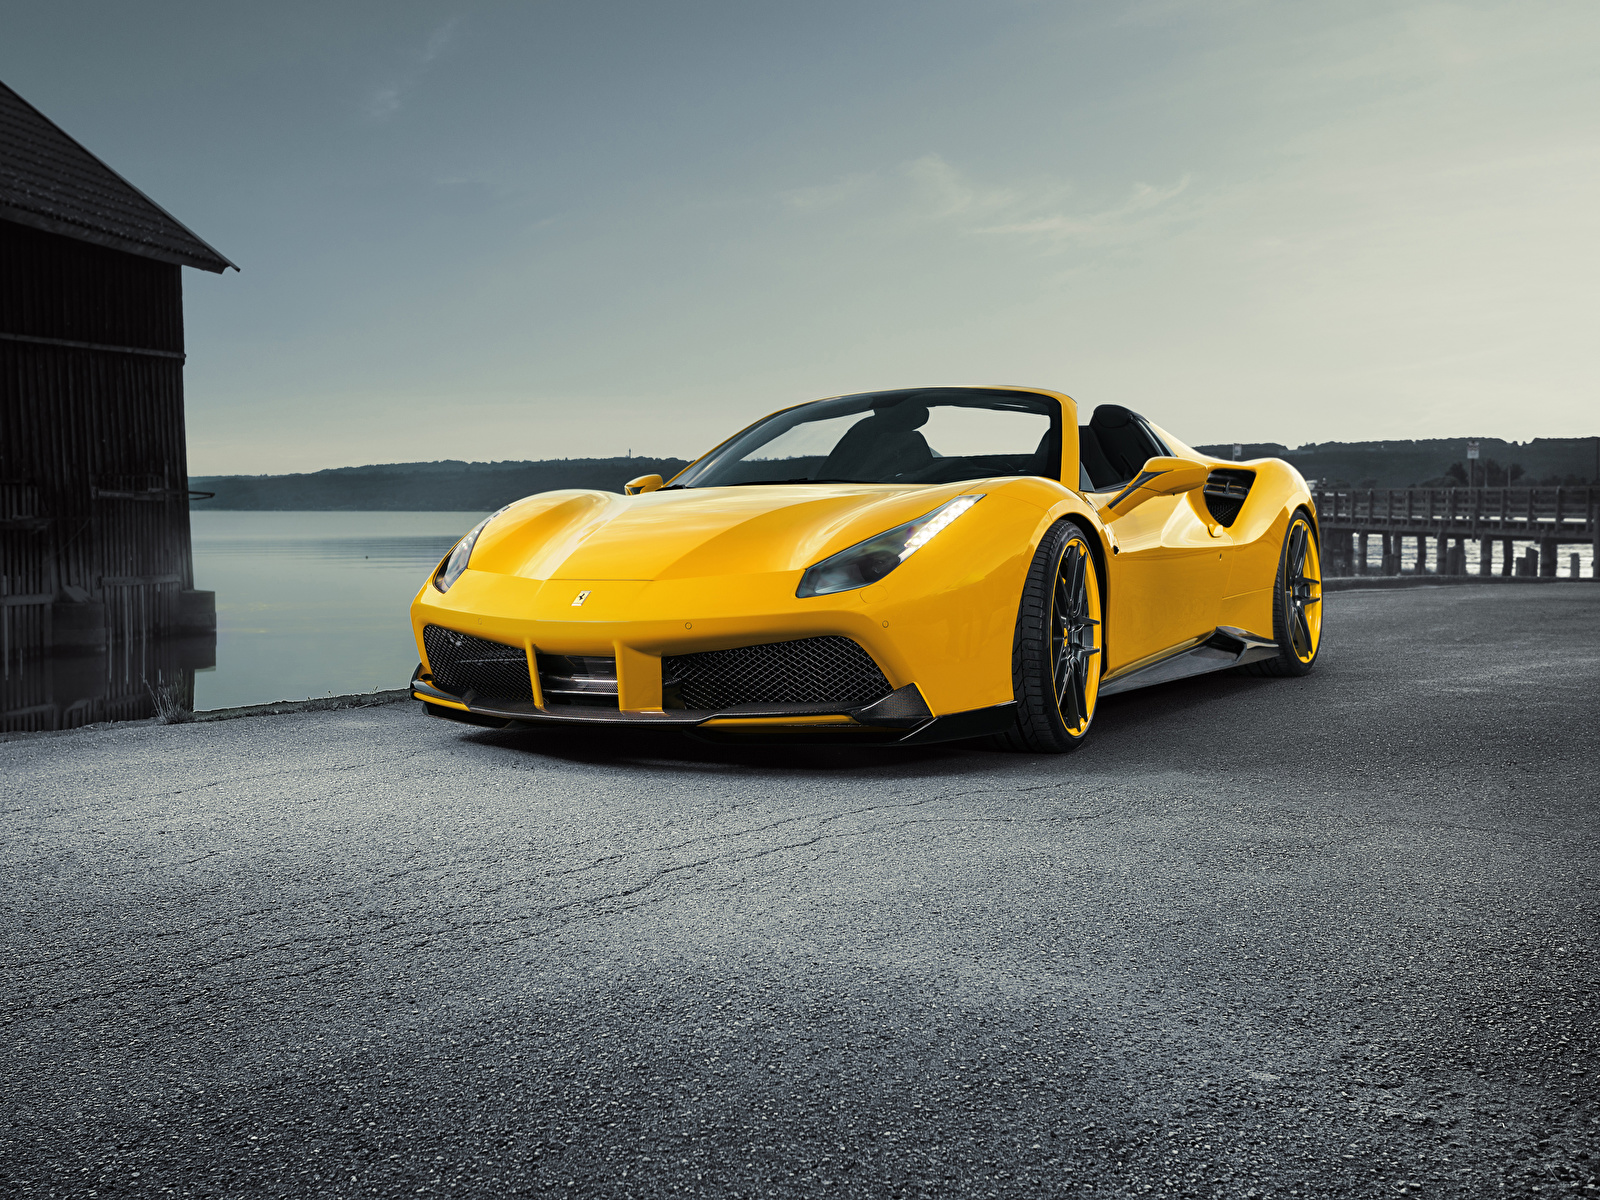 Фотография Ferrari Spider Rosso Novitec 488 Родстер желтая Машины 1600x1200 Феррари желтых желтые Желтый Авто Автомобили